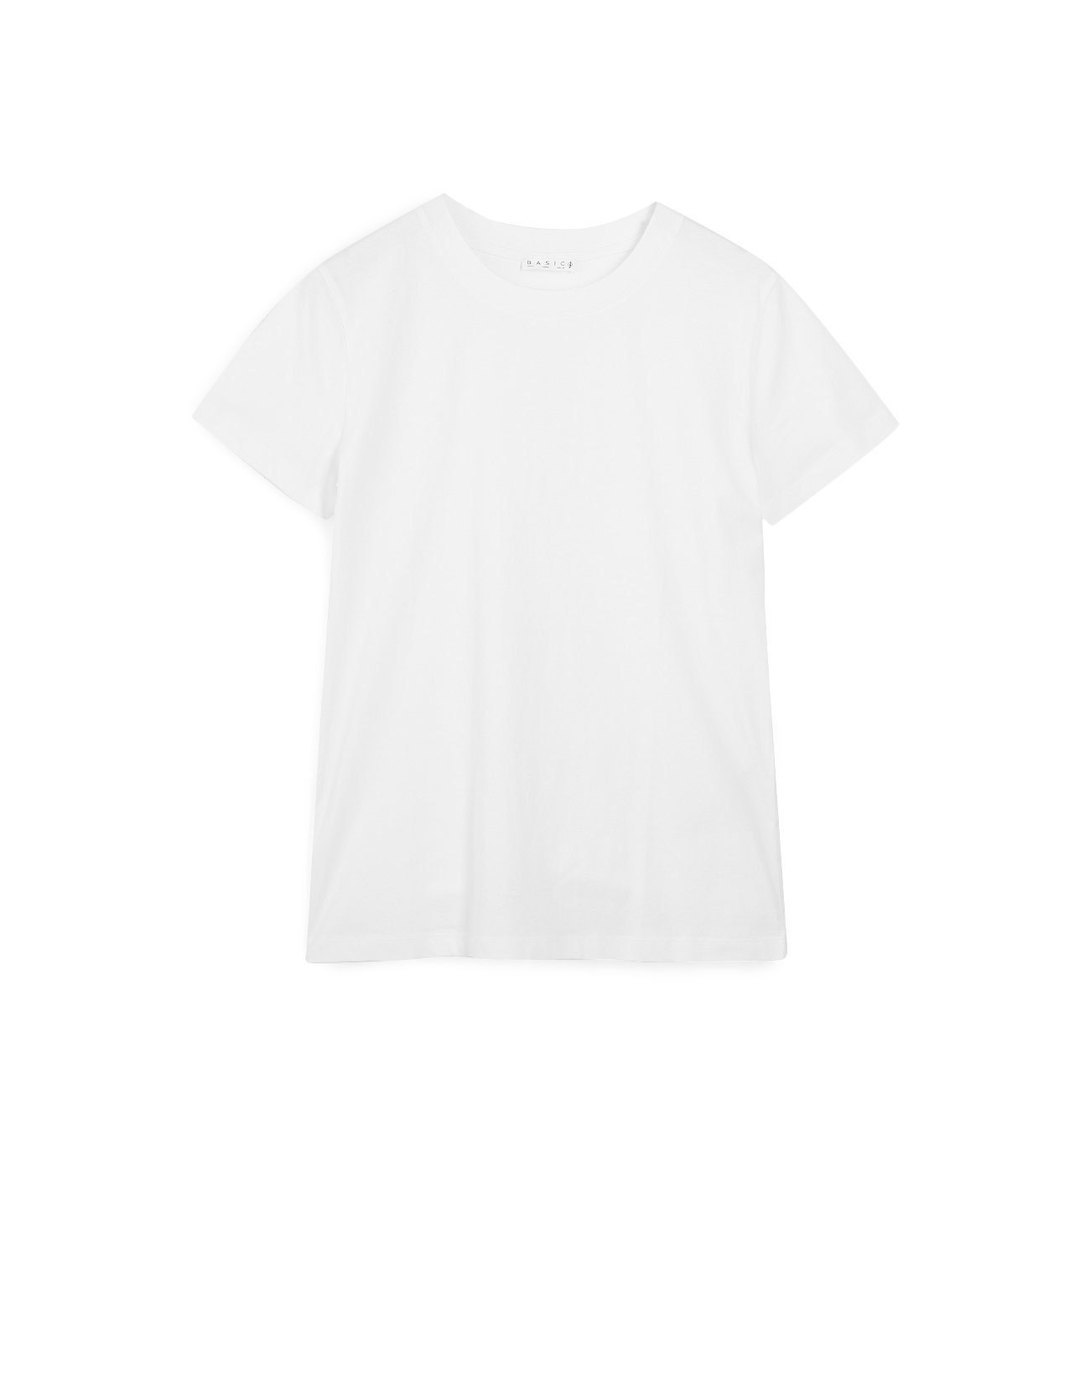 Camiseta básica blanca, de Stradivarius (5,99 euros).